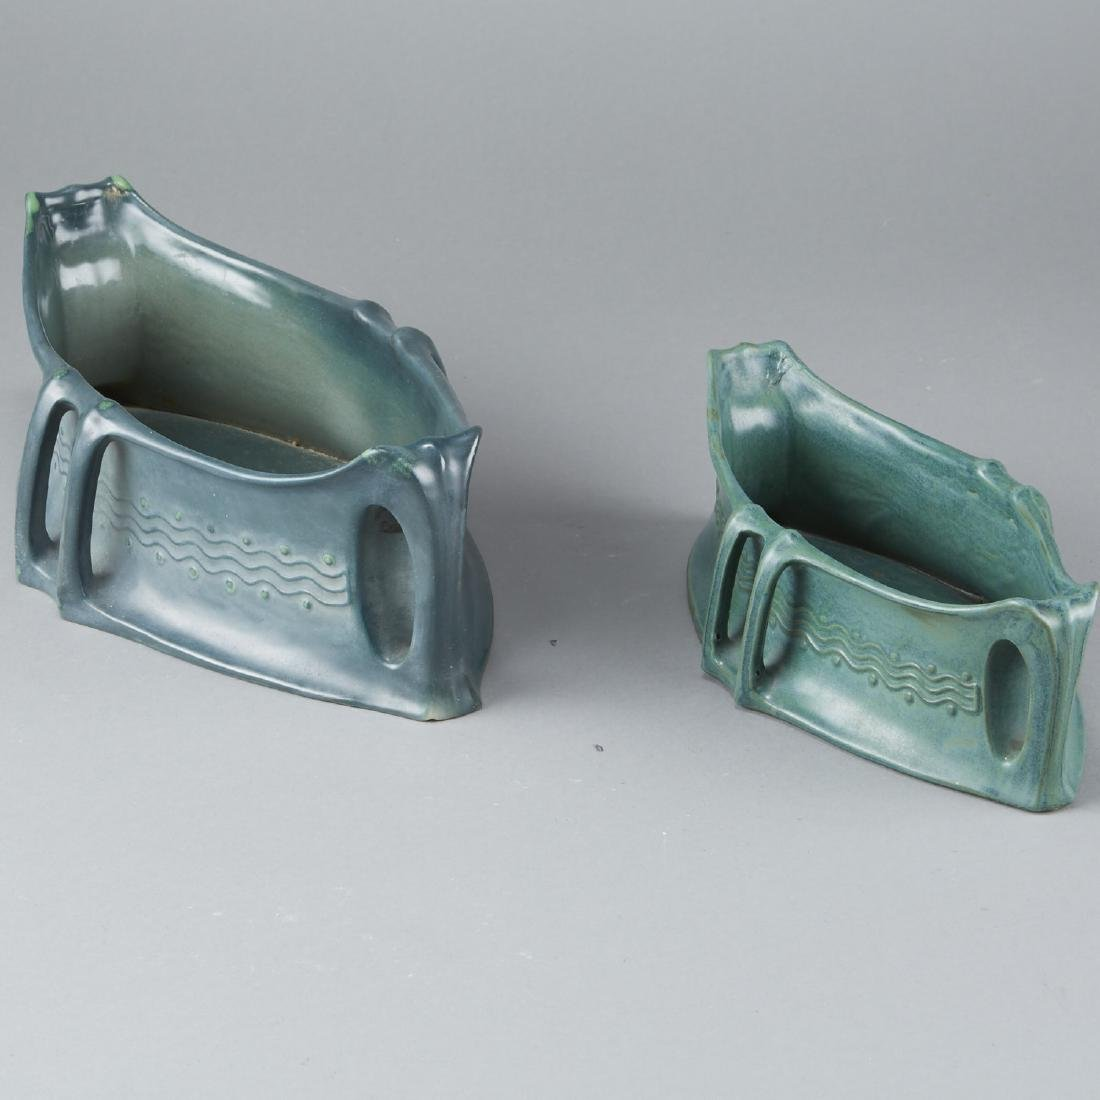 Pair of Amphora Arts and Crafts Basin - 2